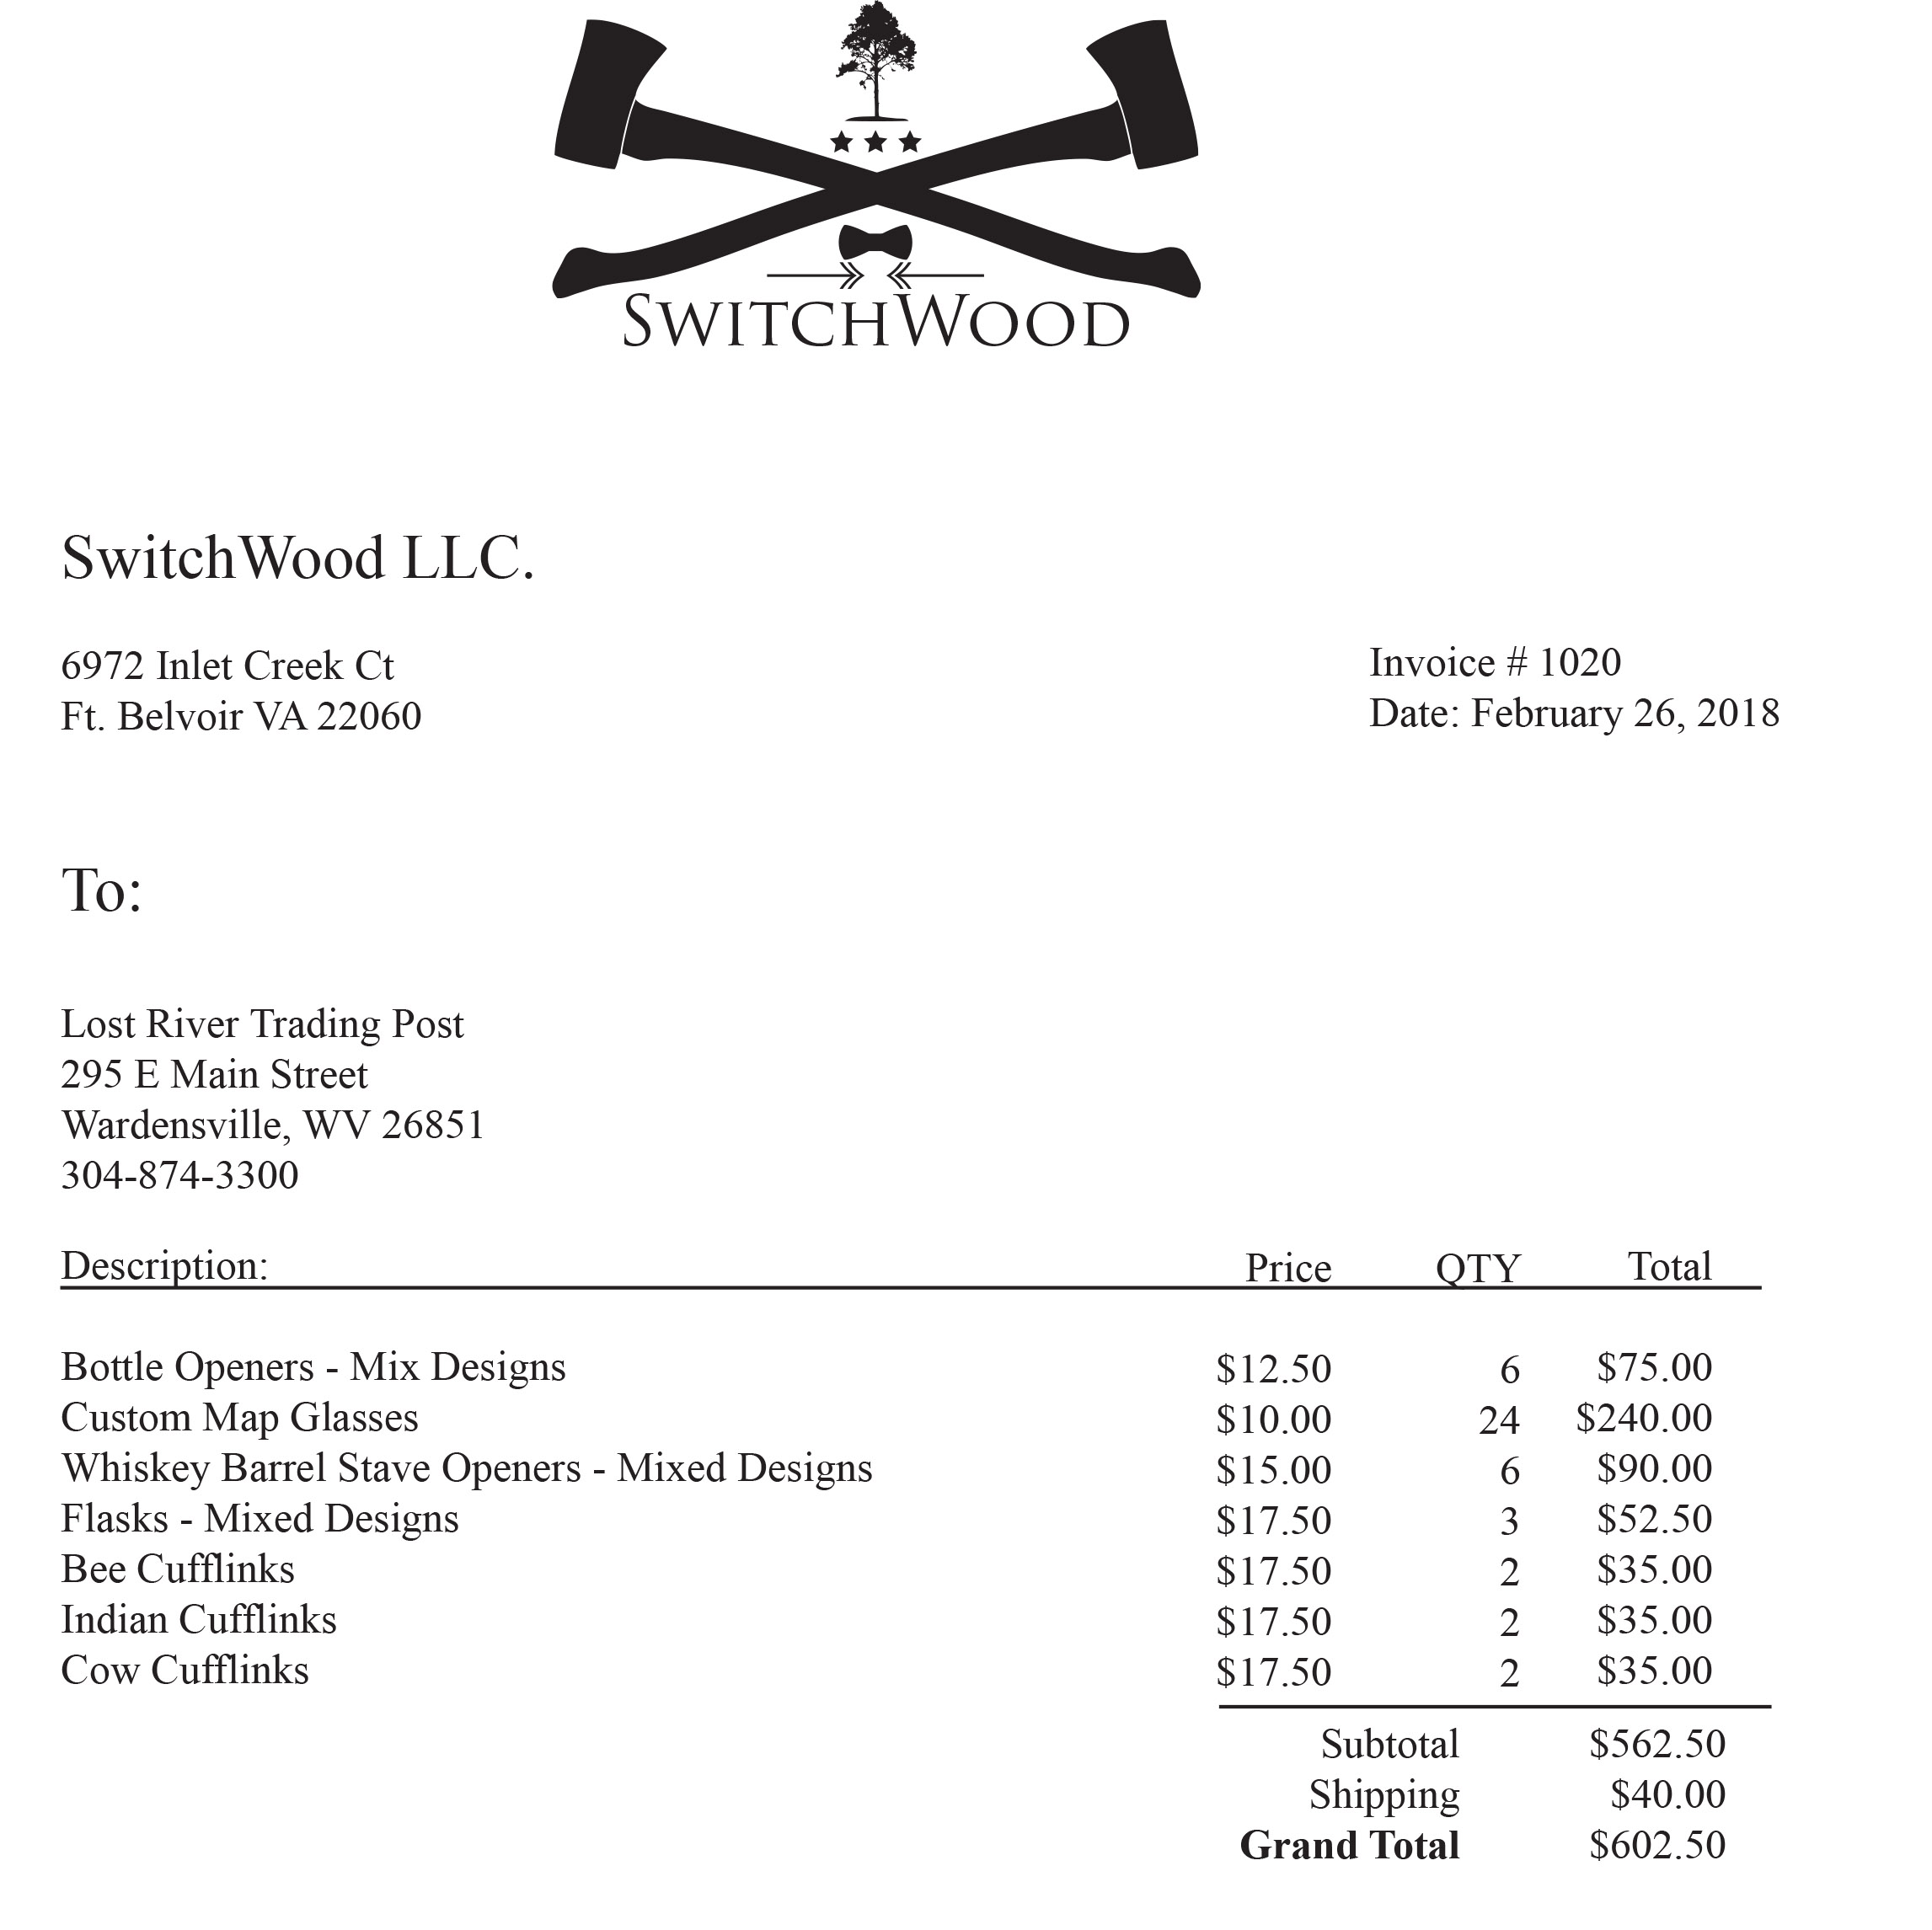 Switchwood Invoice 1020